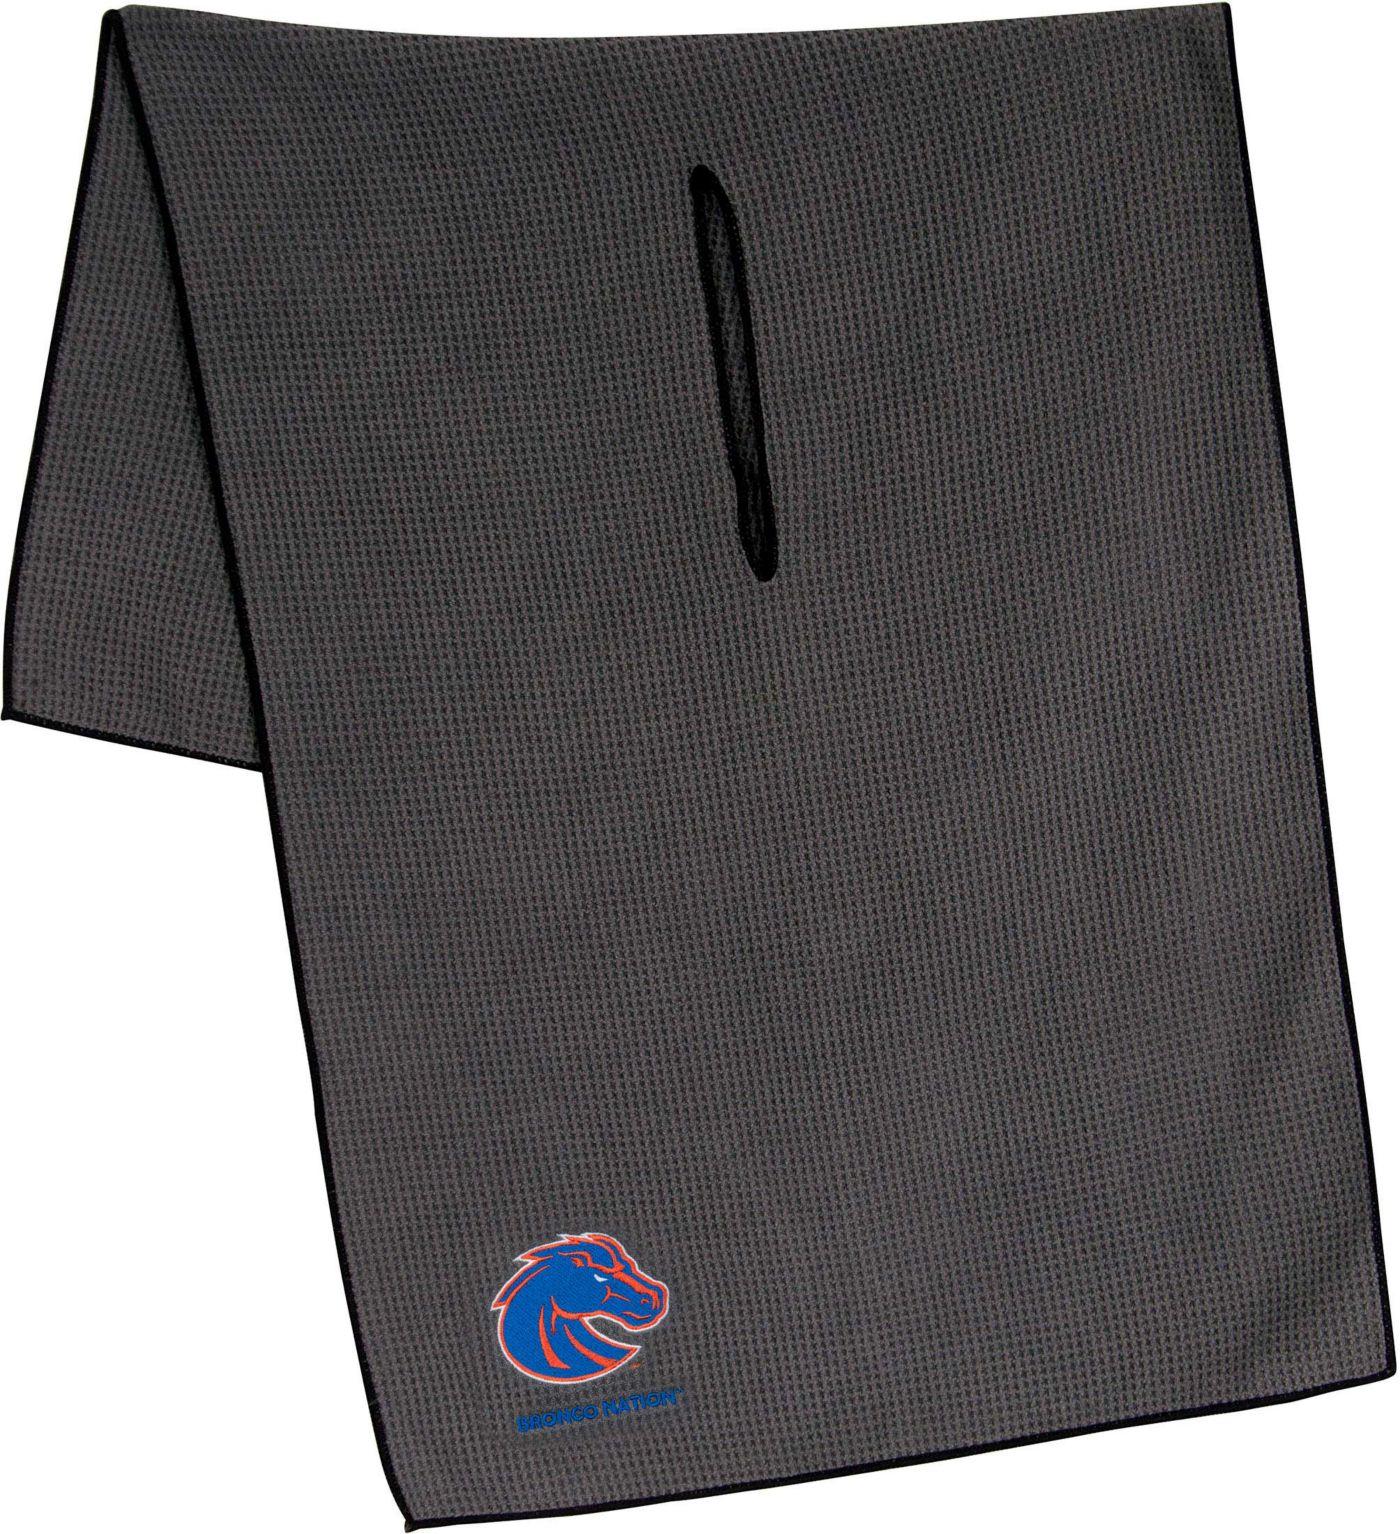 "Team Effort Boise State Broncos 19"" x 41"" Microfiber Golf Towel"